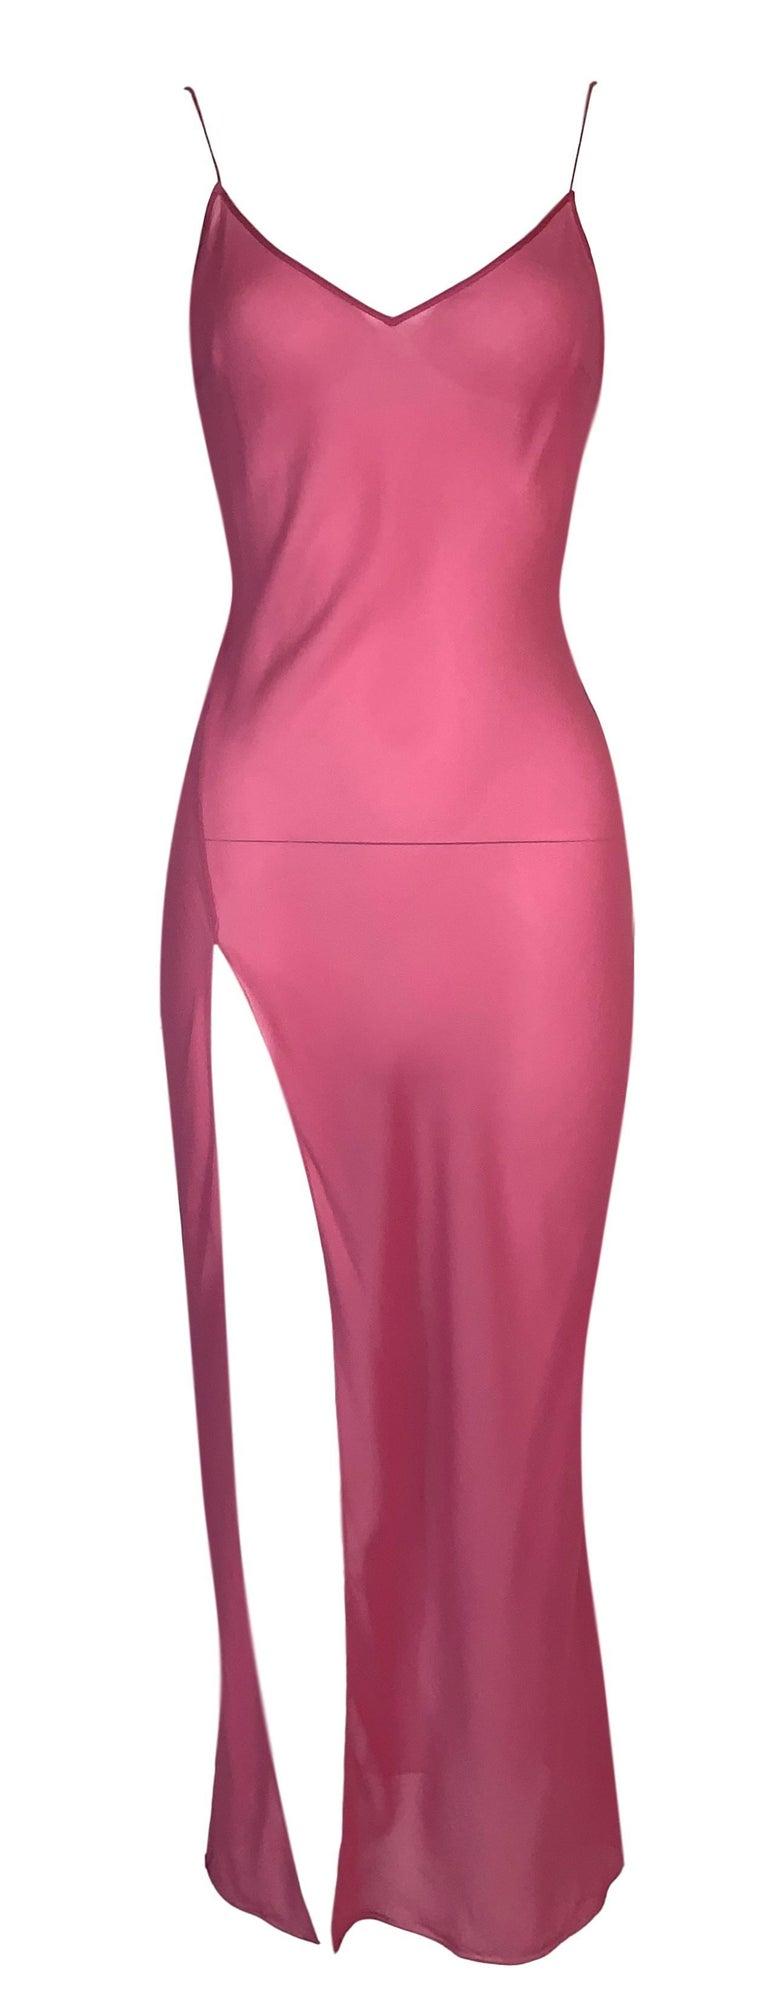 S/S 2002 Christian Dior John Galliano Runway Sheer Pink Hooded 2 Dresses 2